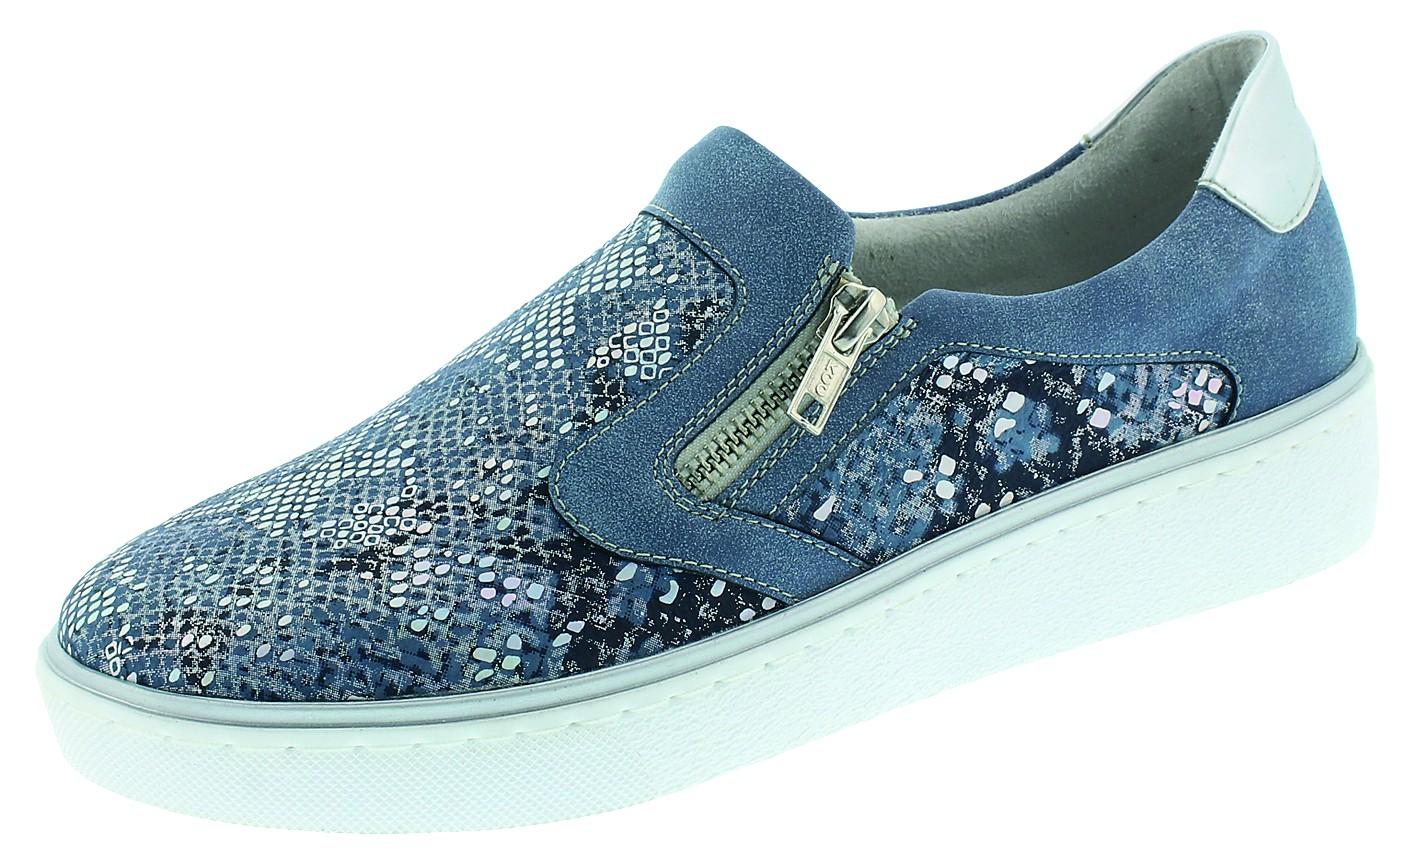 Remonte Damenschuhe sportlich D.Sneaker Blau R5504 12 BDRIB/